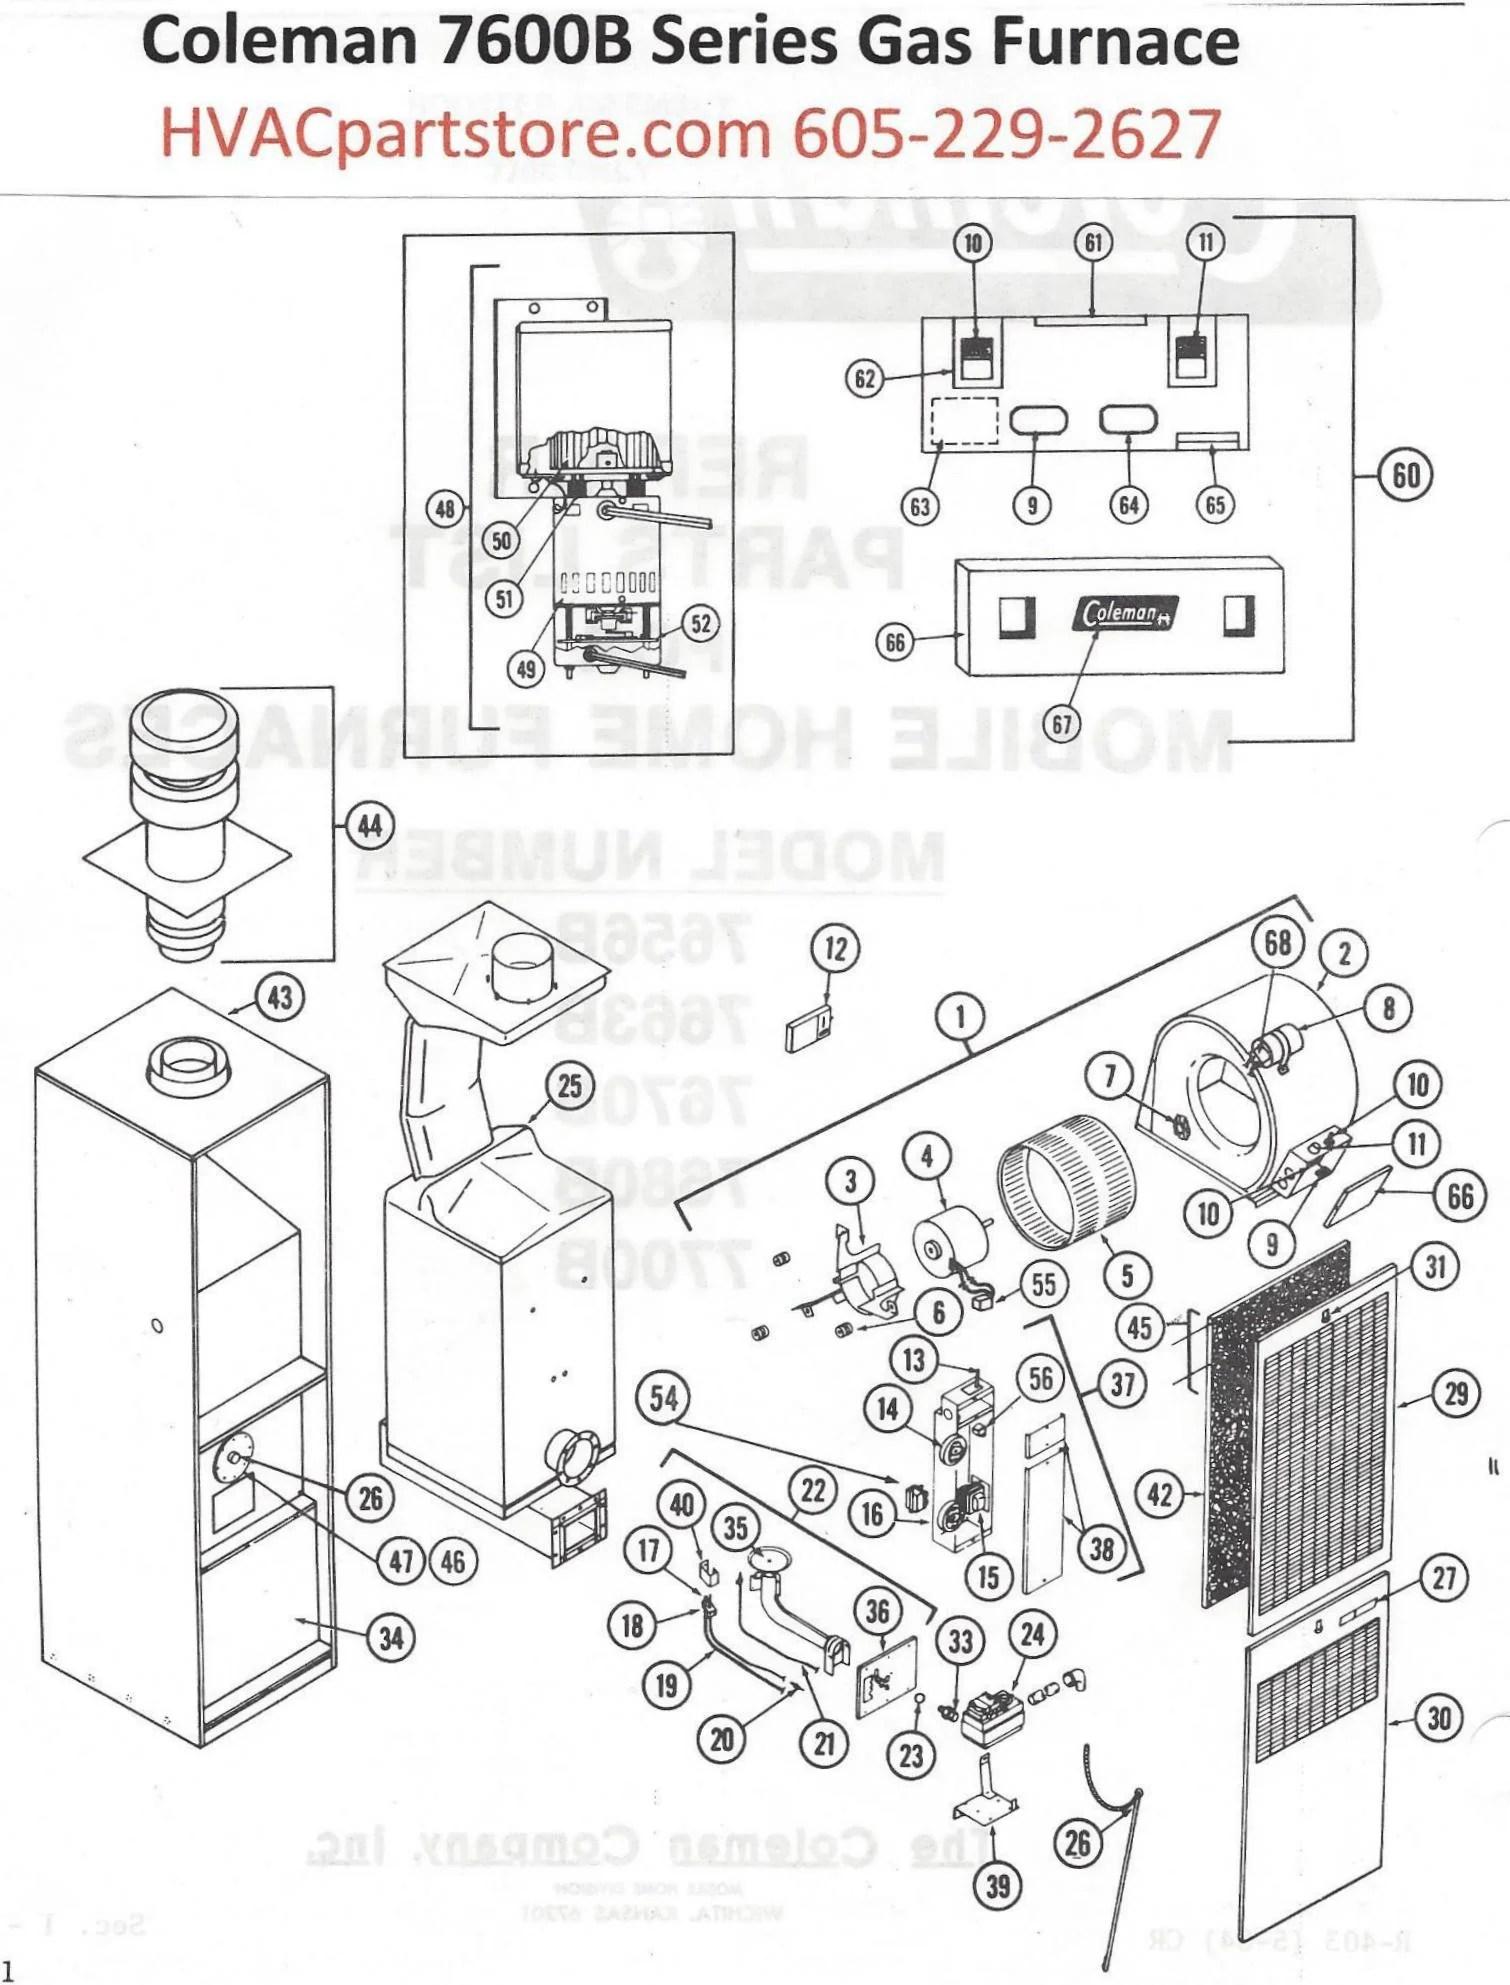 7656b856 coleman gas furnace parts [ 1510 x 1985 Pixel ]